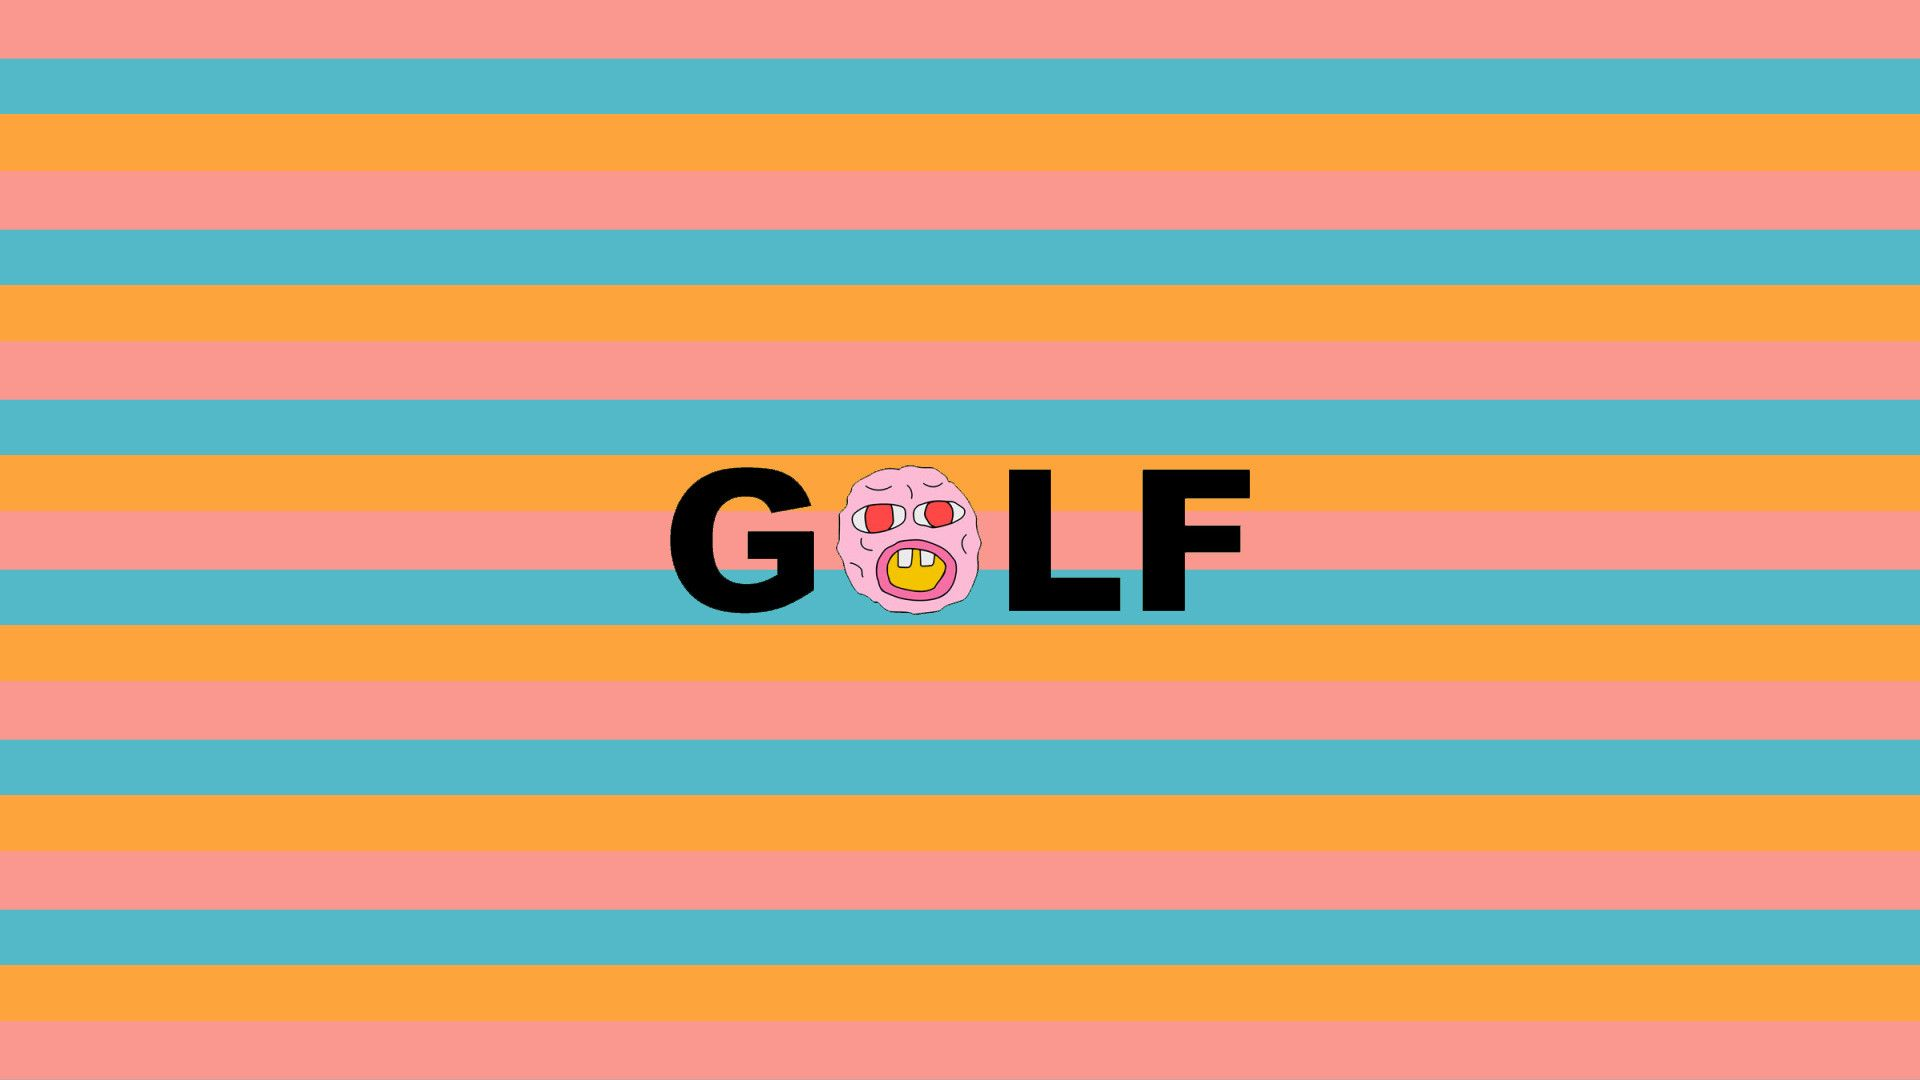 Odd Future Golf Wallpapers On Wallpaperdog